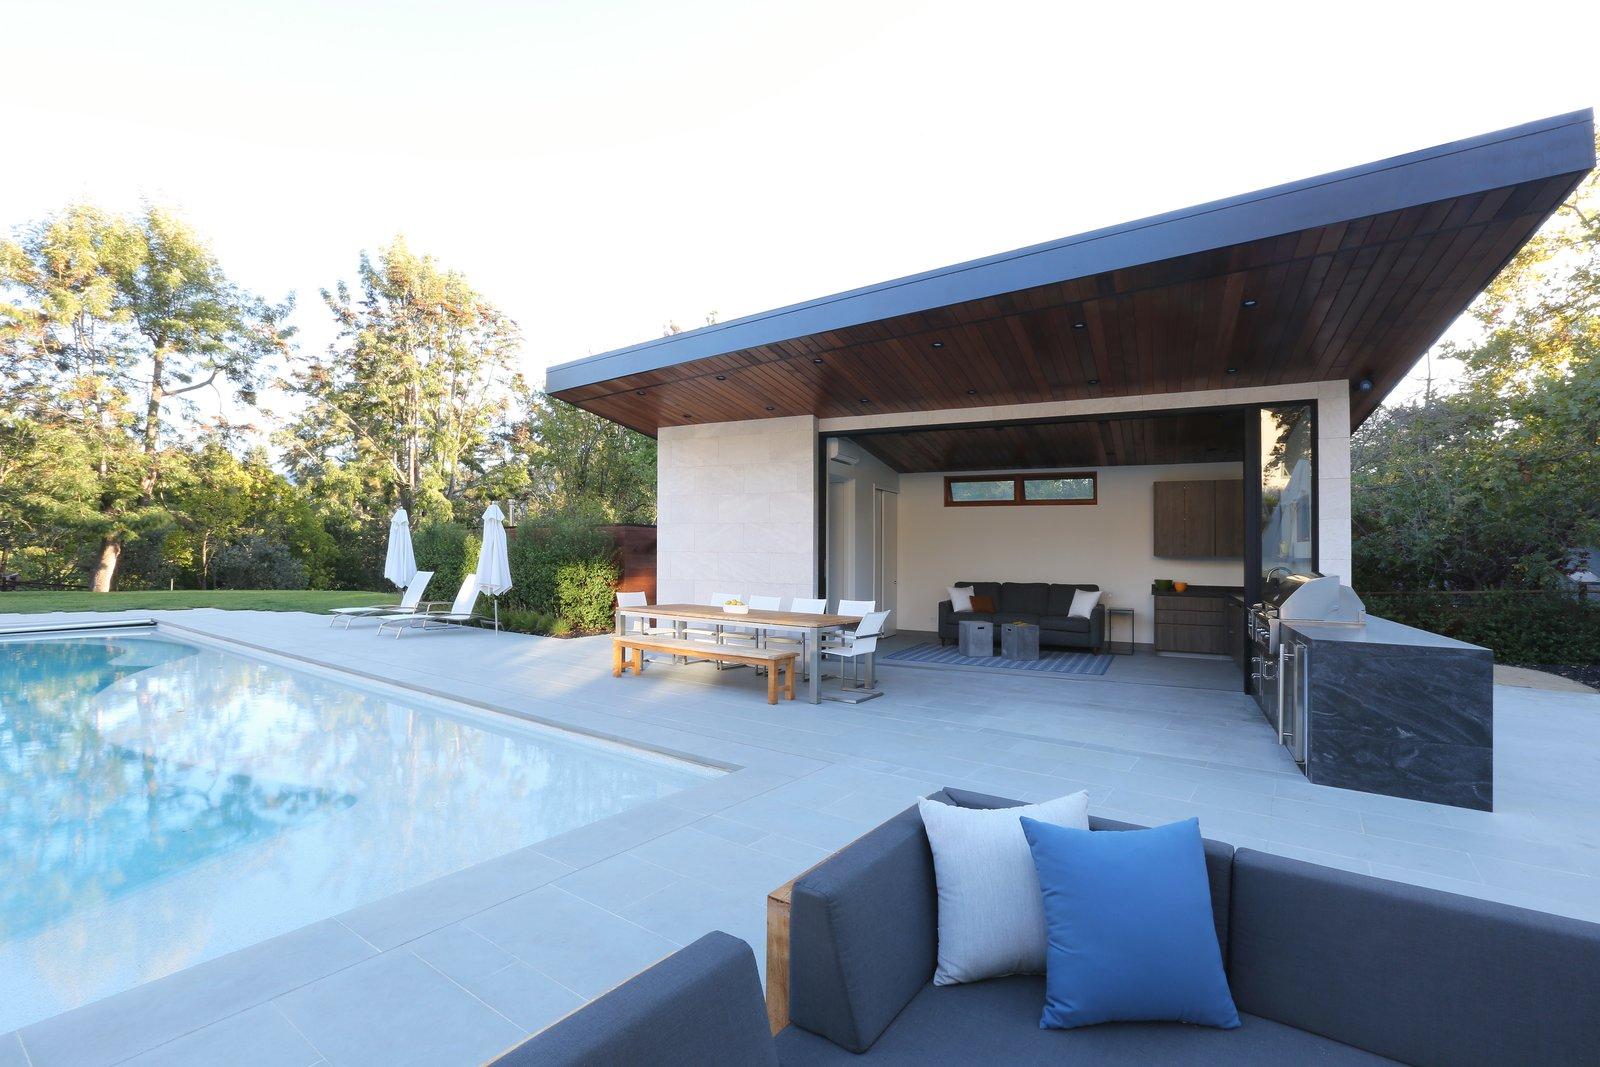 Pool & Pool House  Los Altos Hills Landscape by Greenblott Design